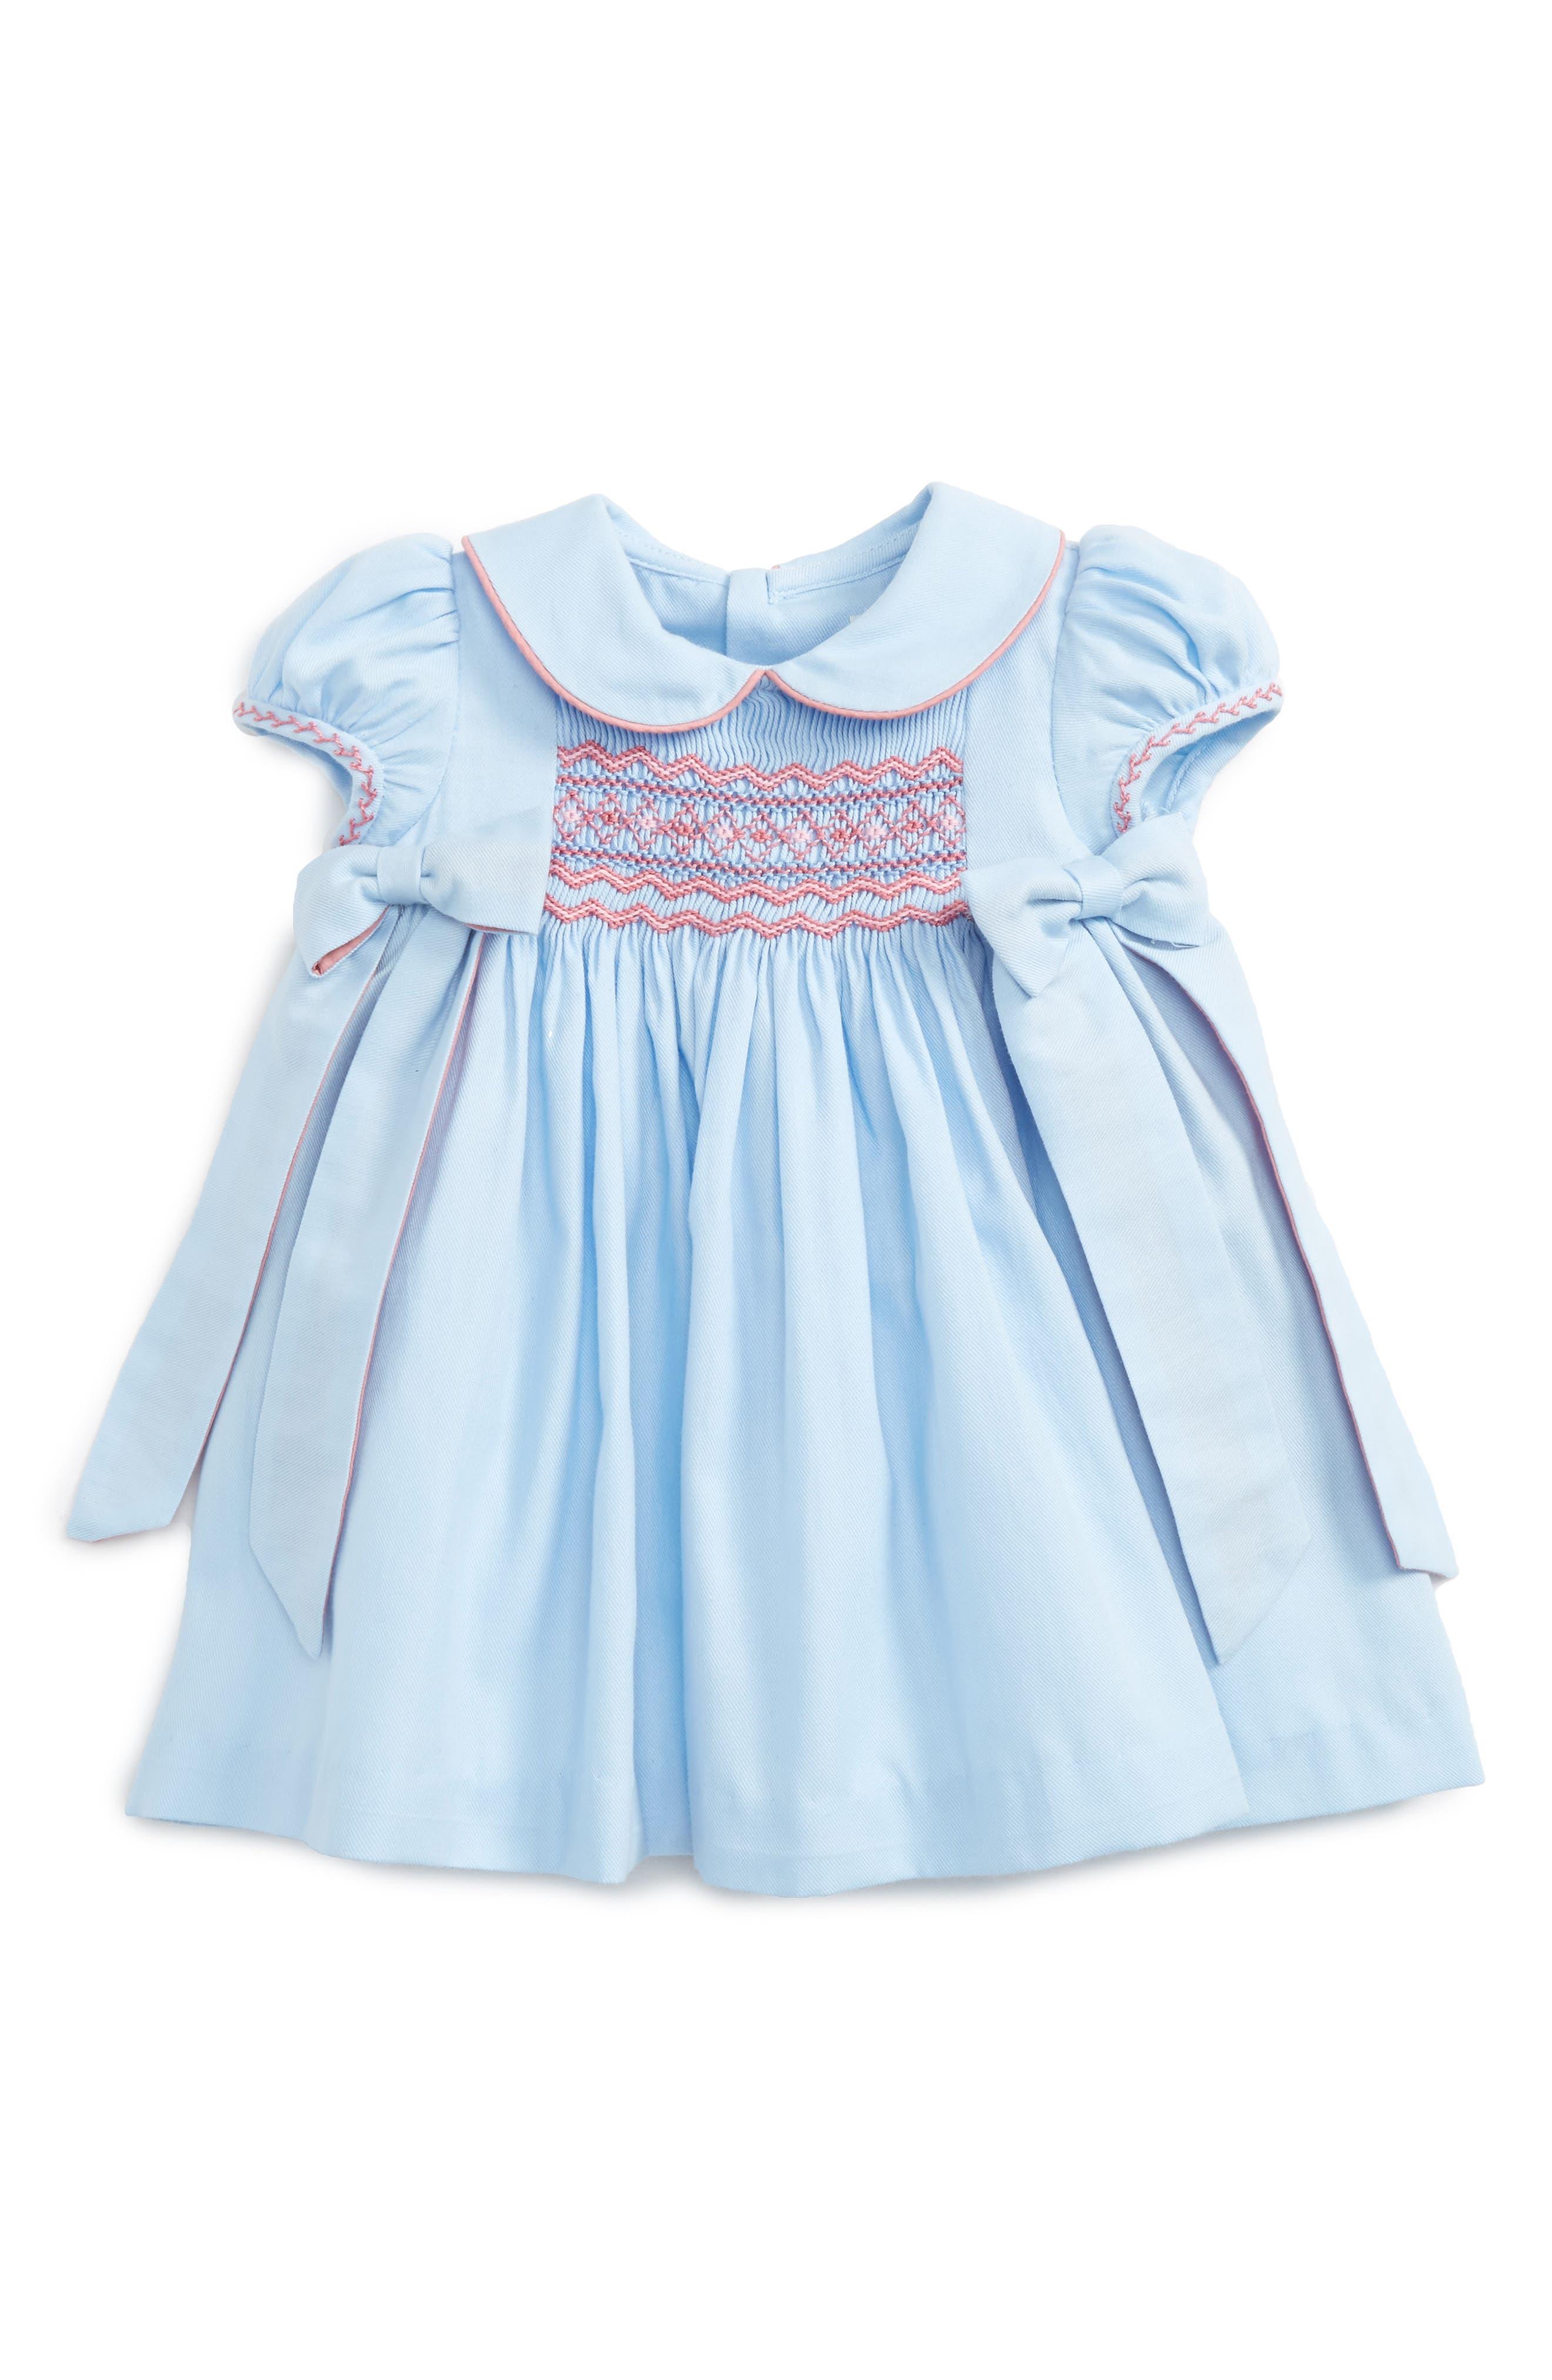 Main Image - Luli & Me Charlotte Smocked Dress (Baby Girls)